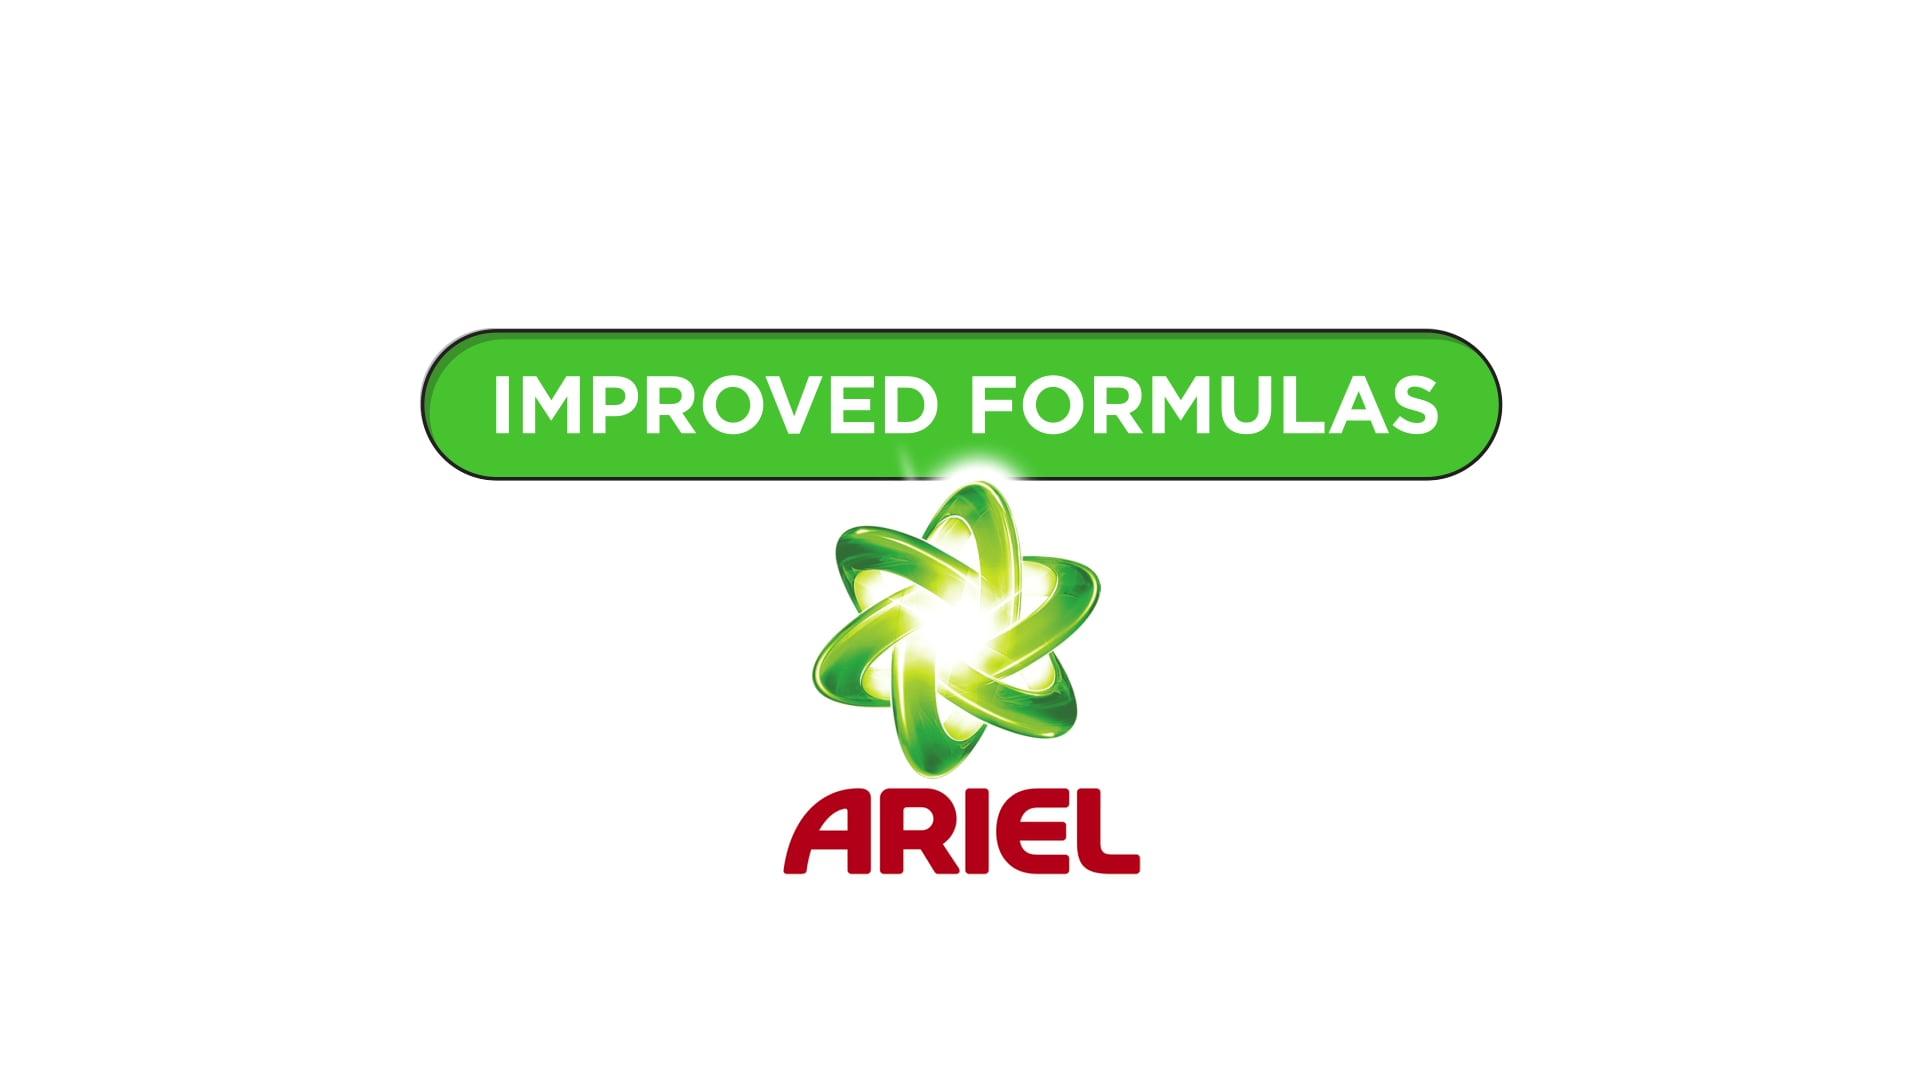 Ariel Improved Formulas